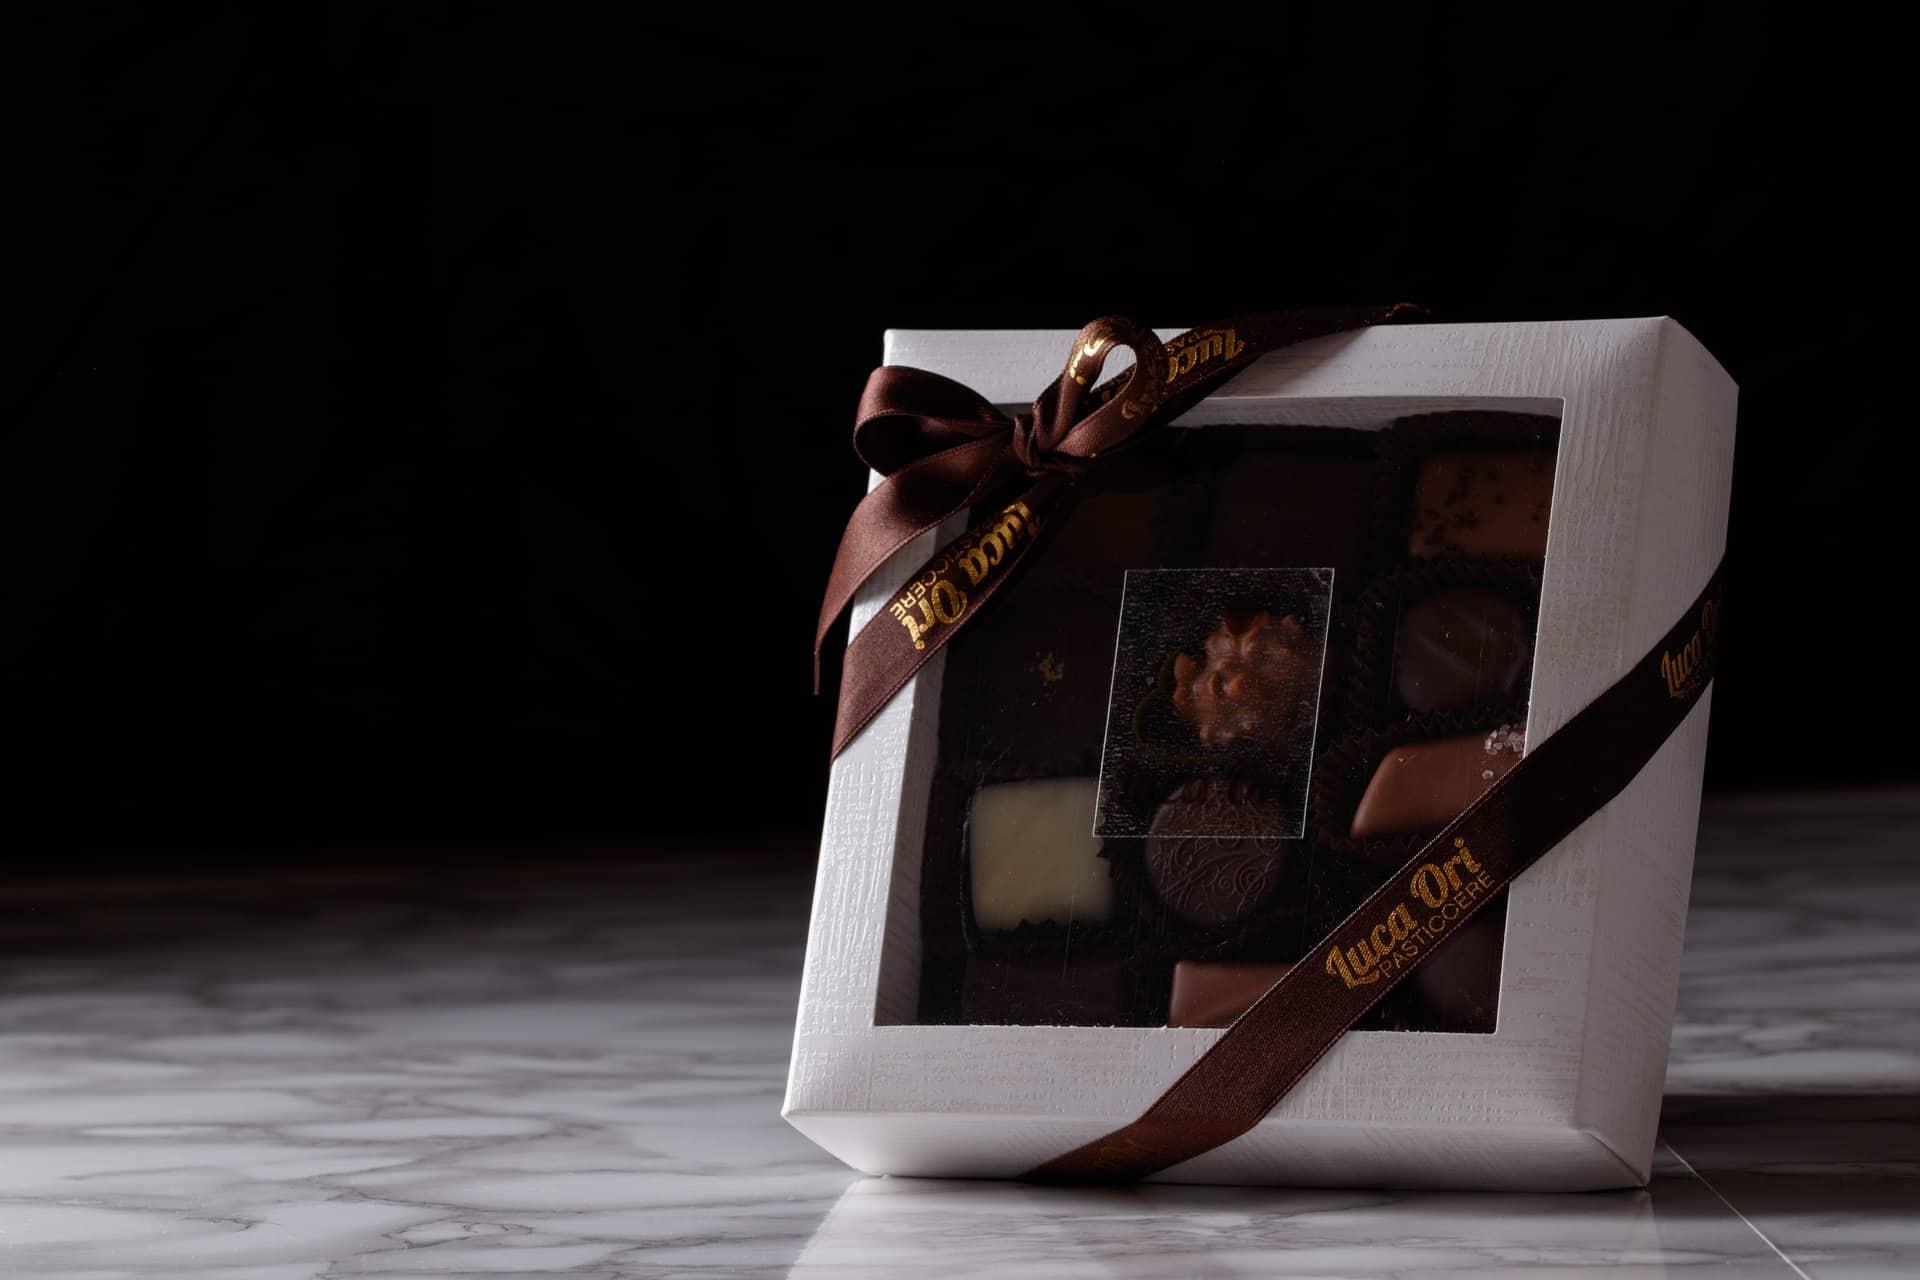 Cioccolatini 40